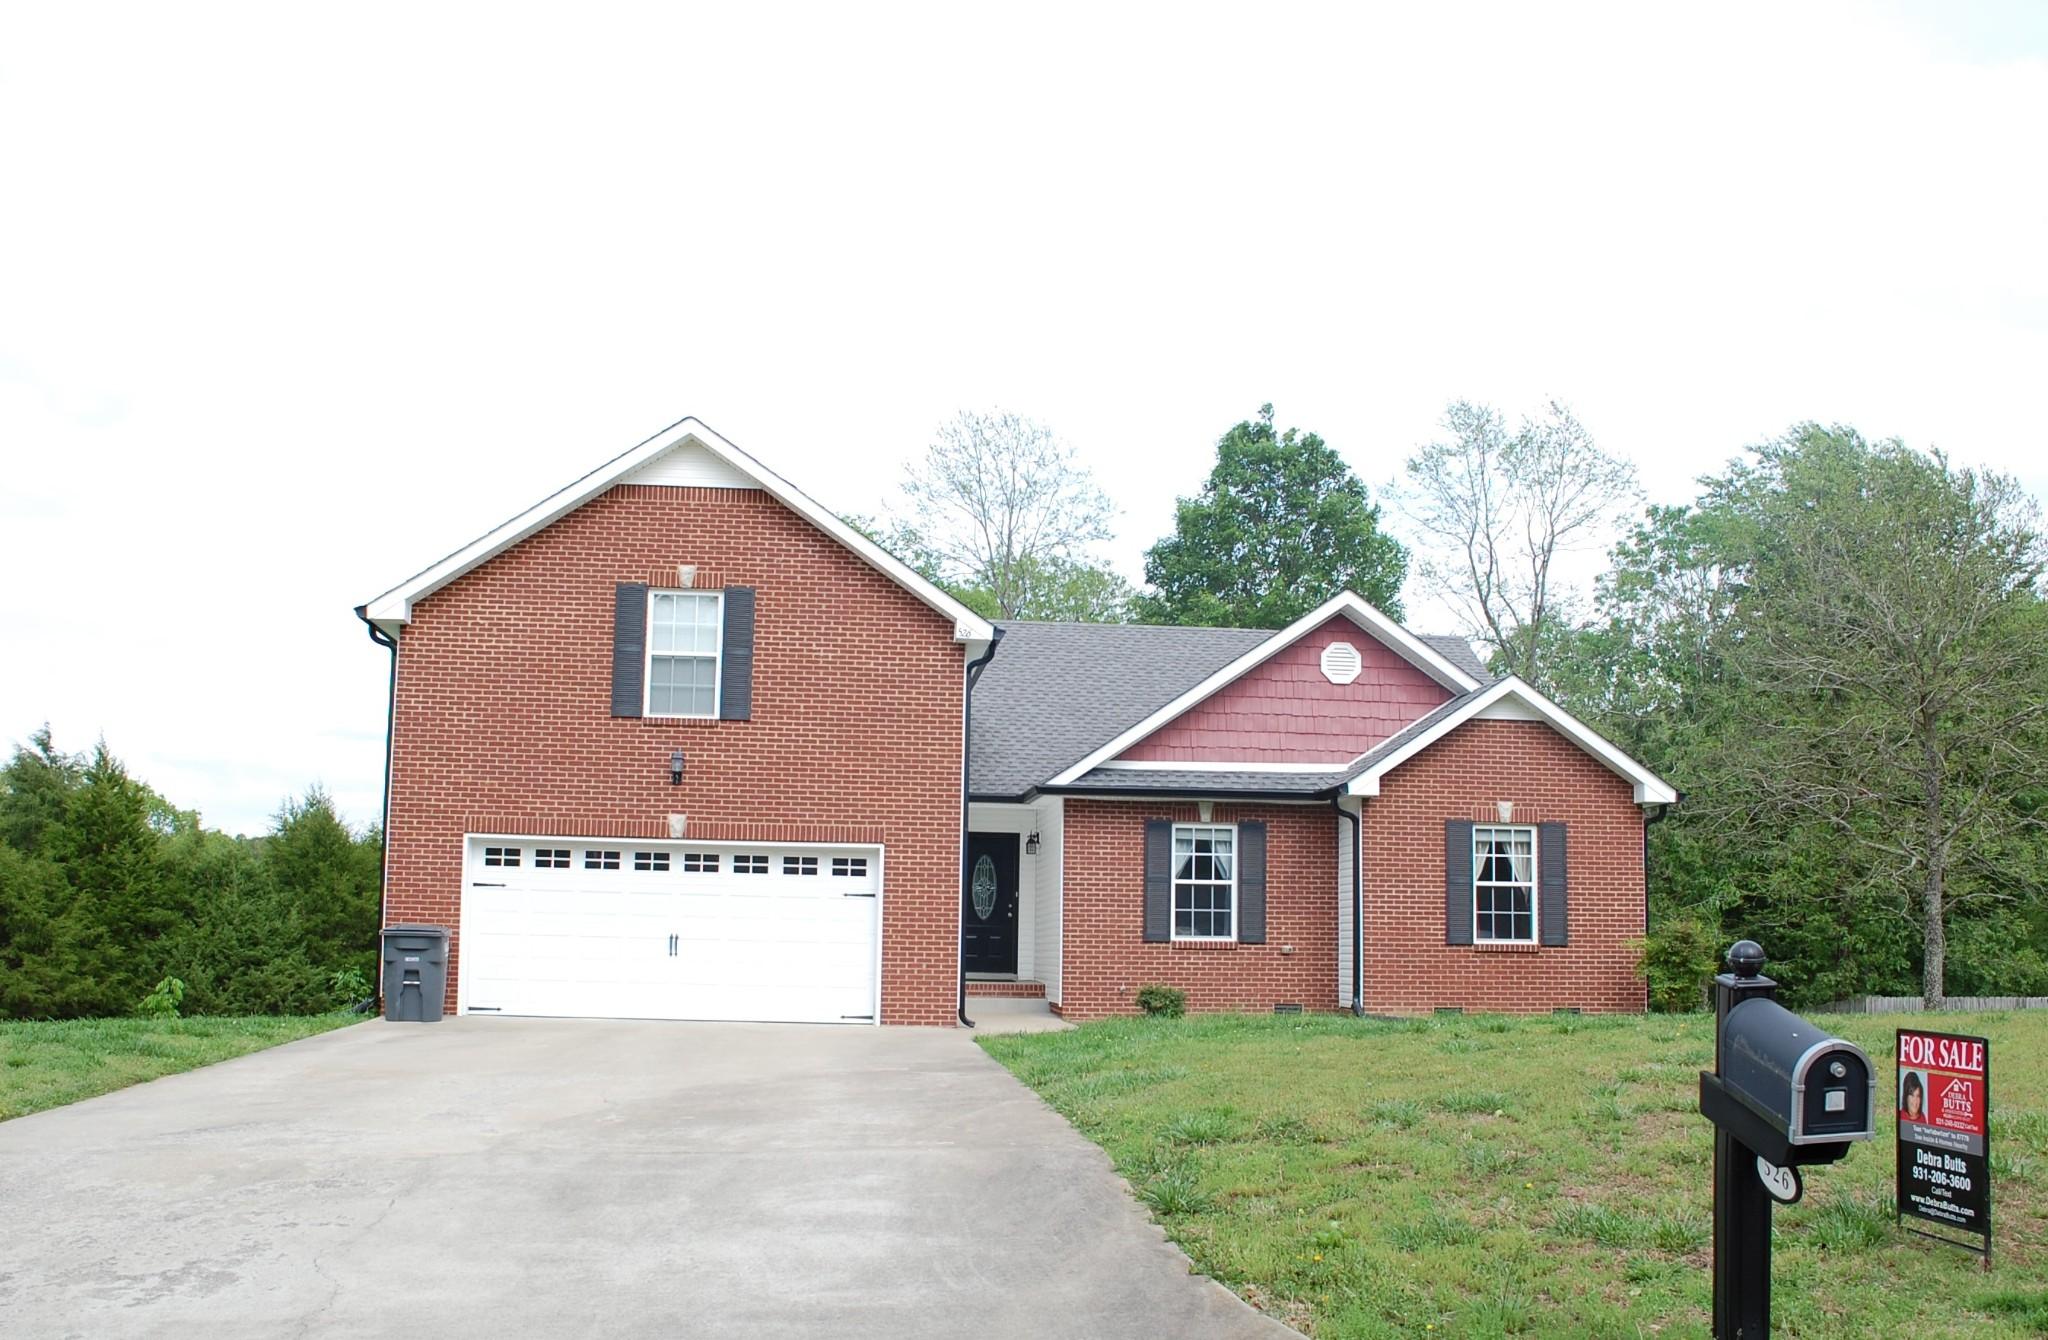 Homes for Sale in Glenstone Subdivision Clarksville TN 37040